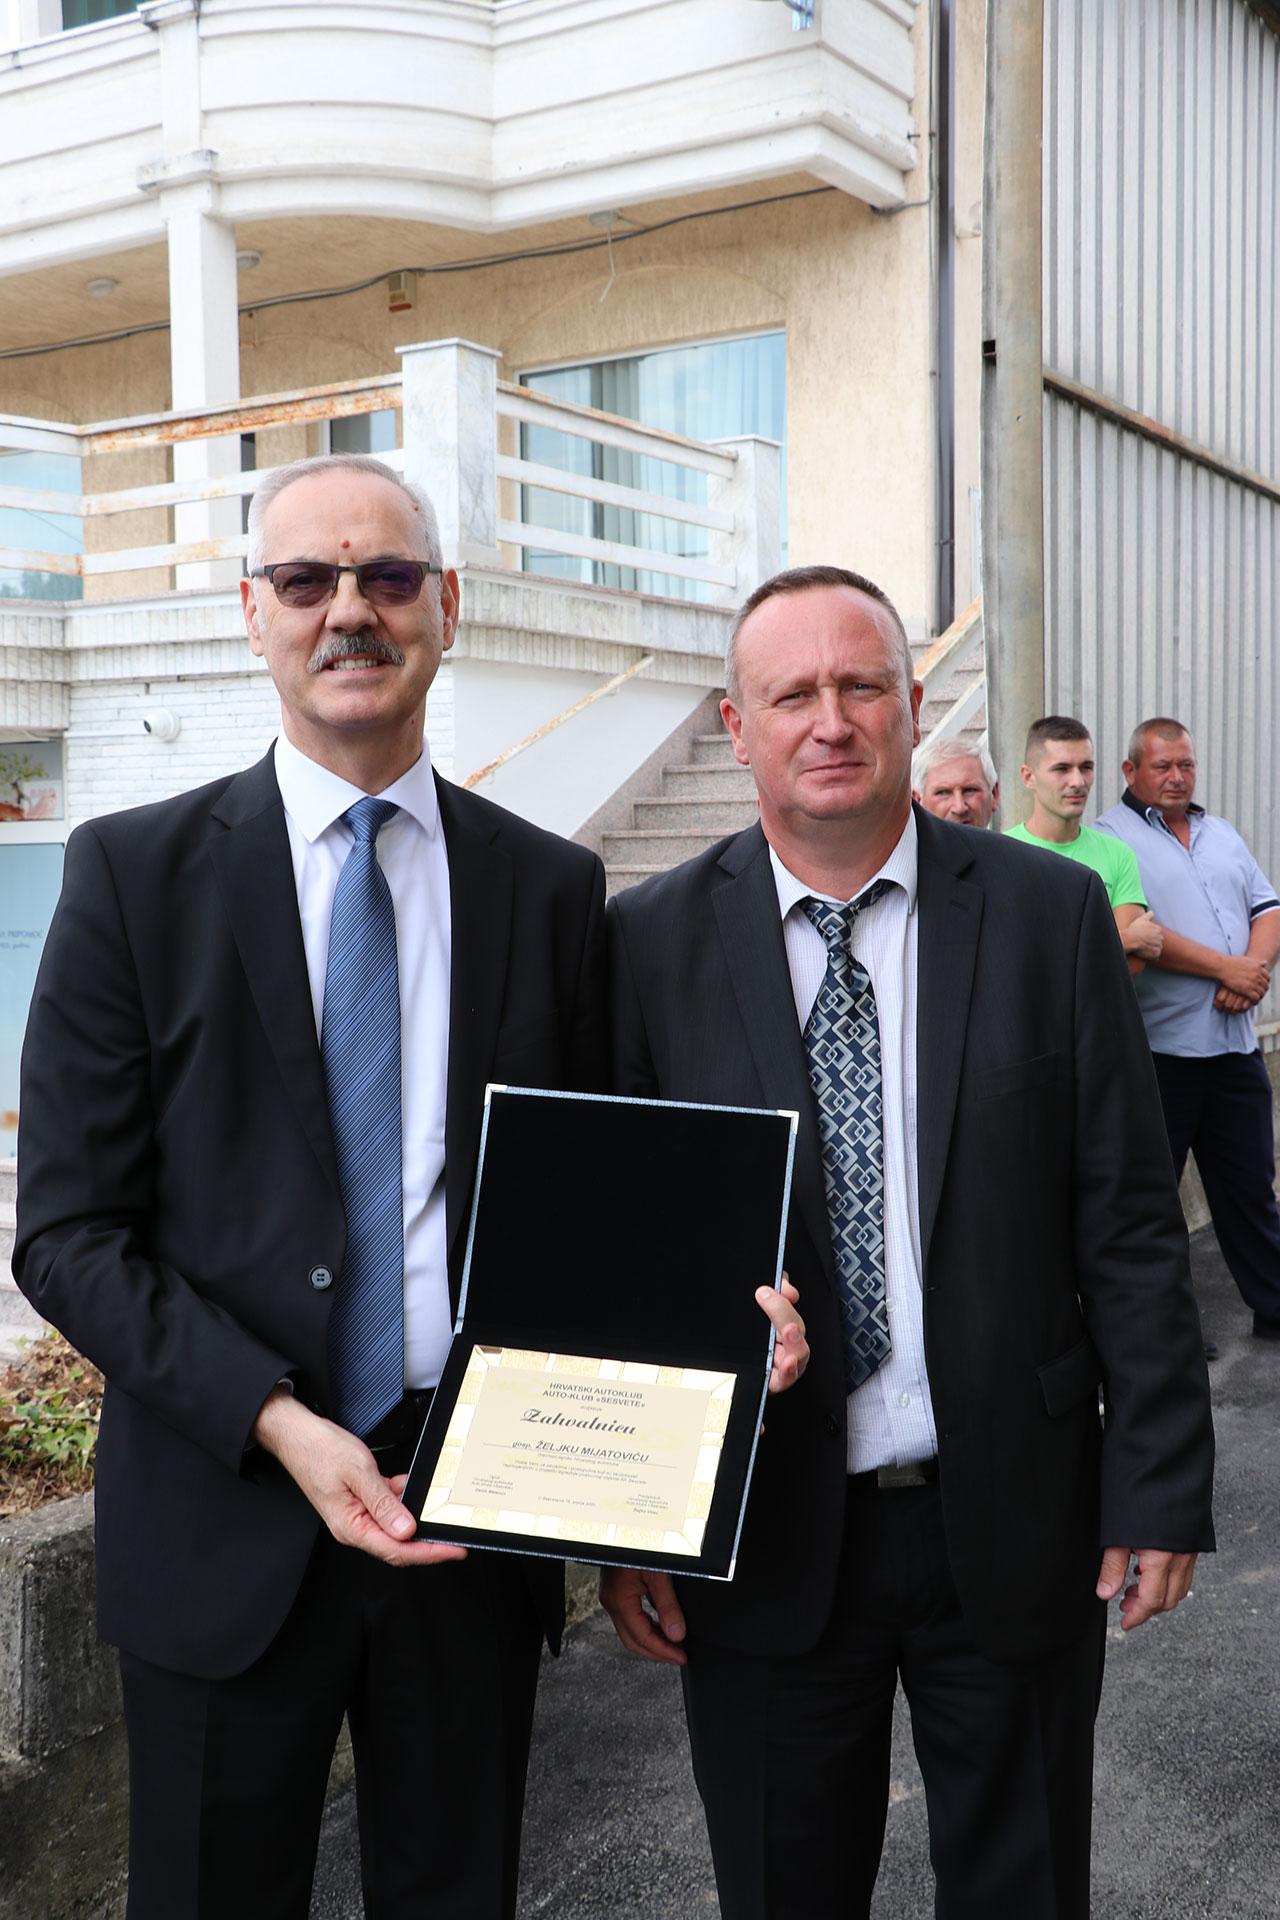 Glavni tajnik HAK-a Željko Mijatović i tajnik Autokluba Sesvete Damir Matacun